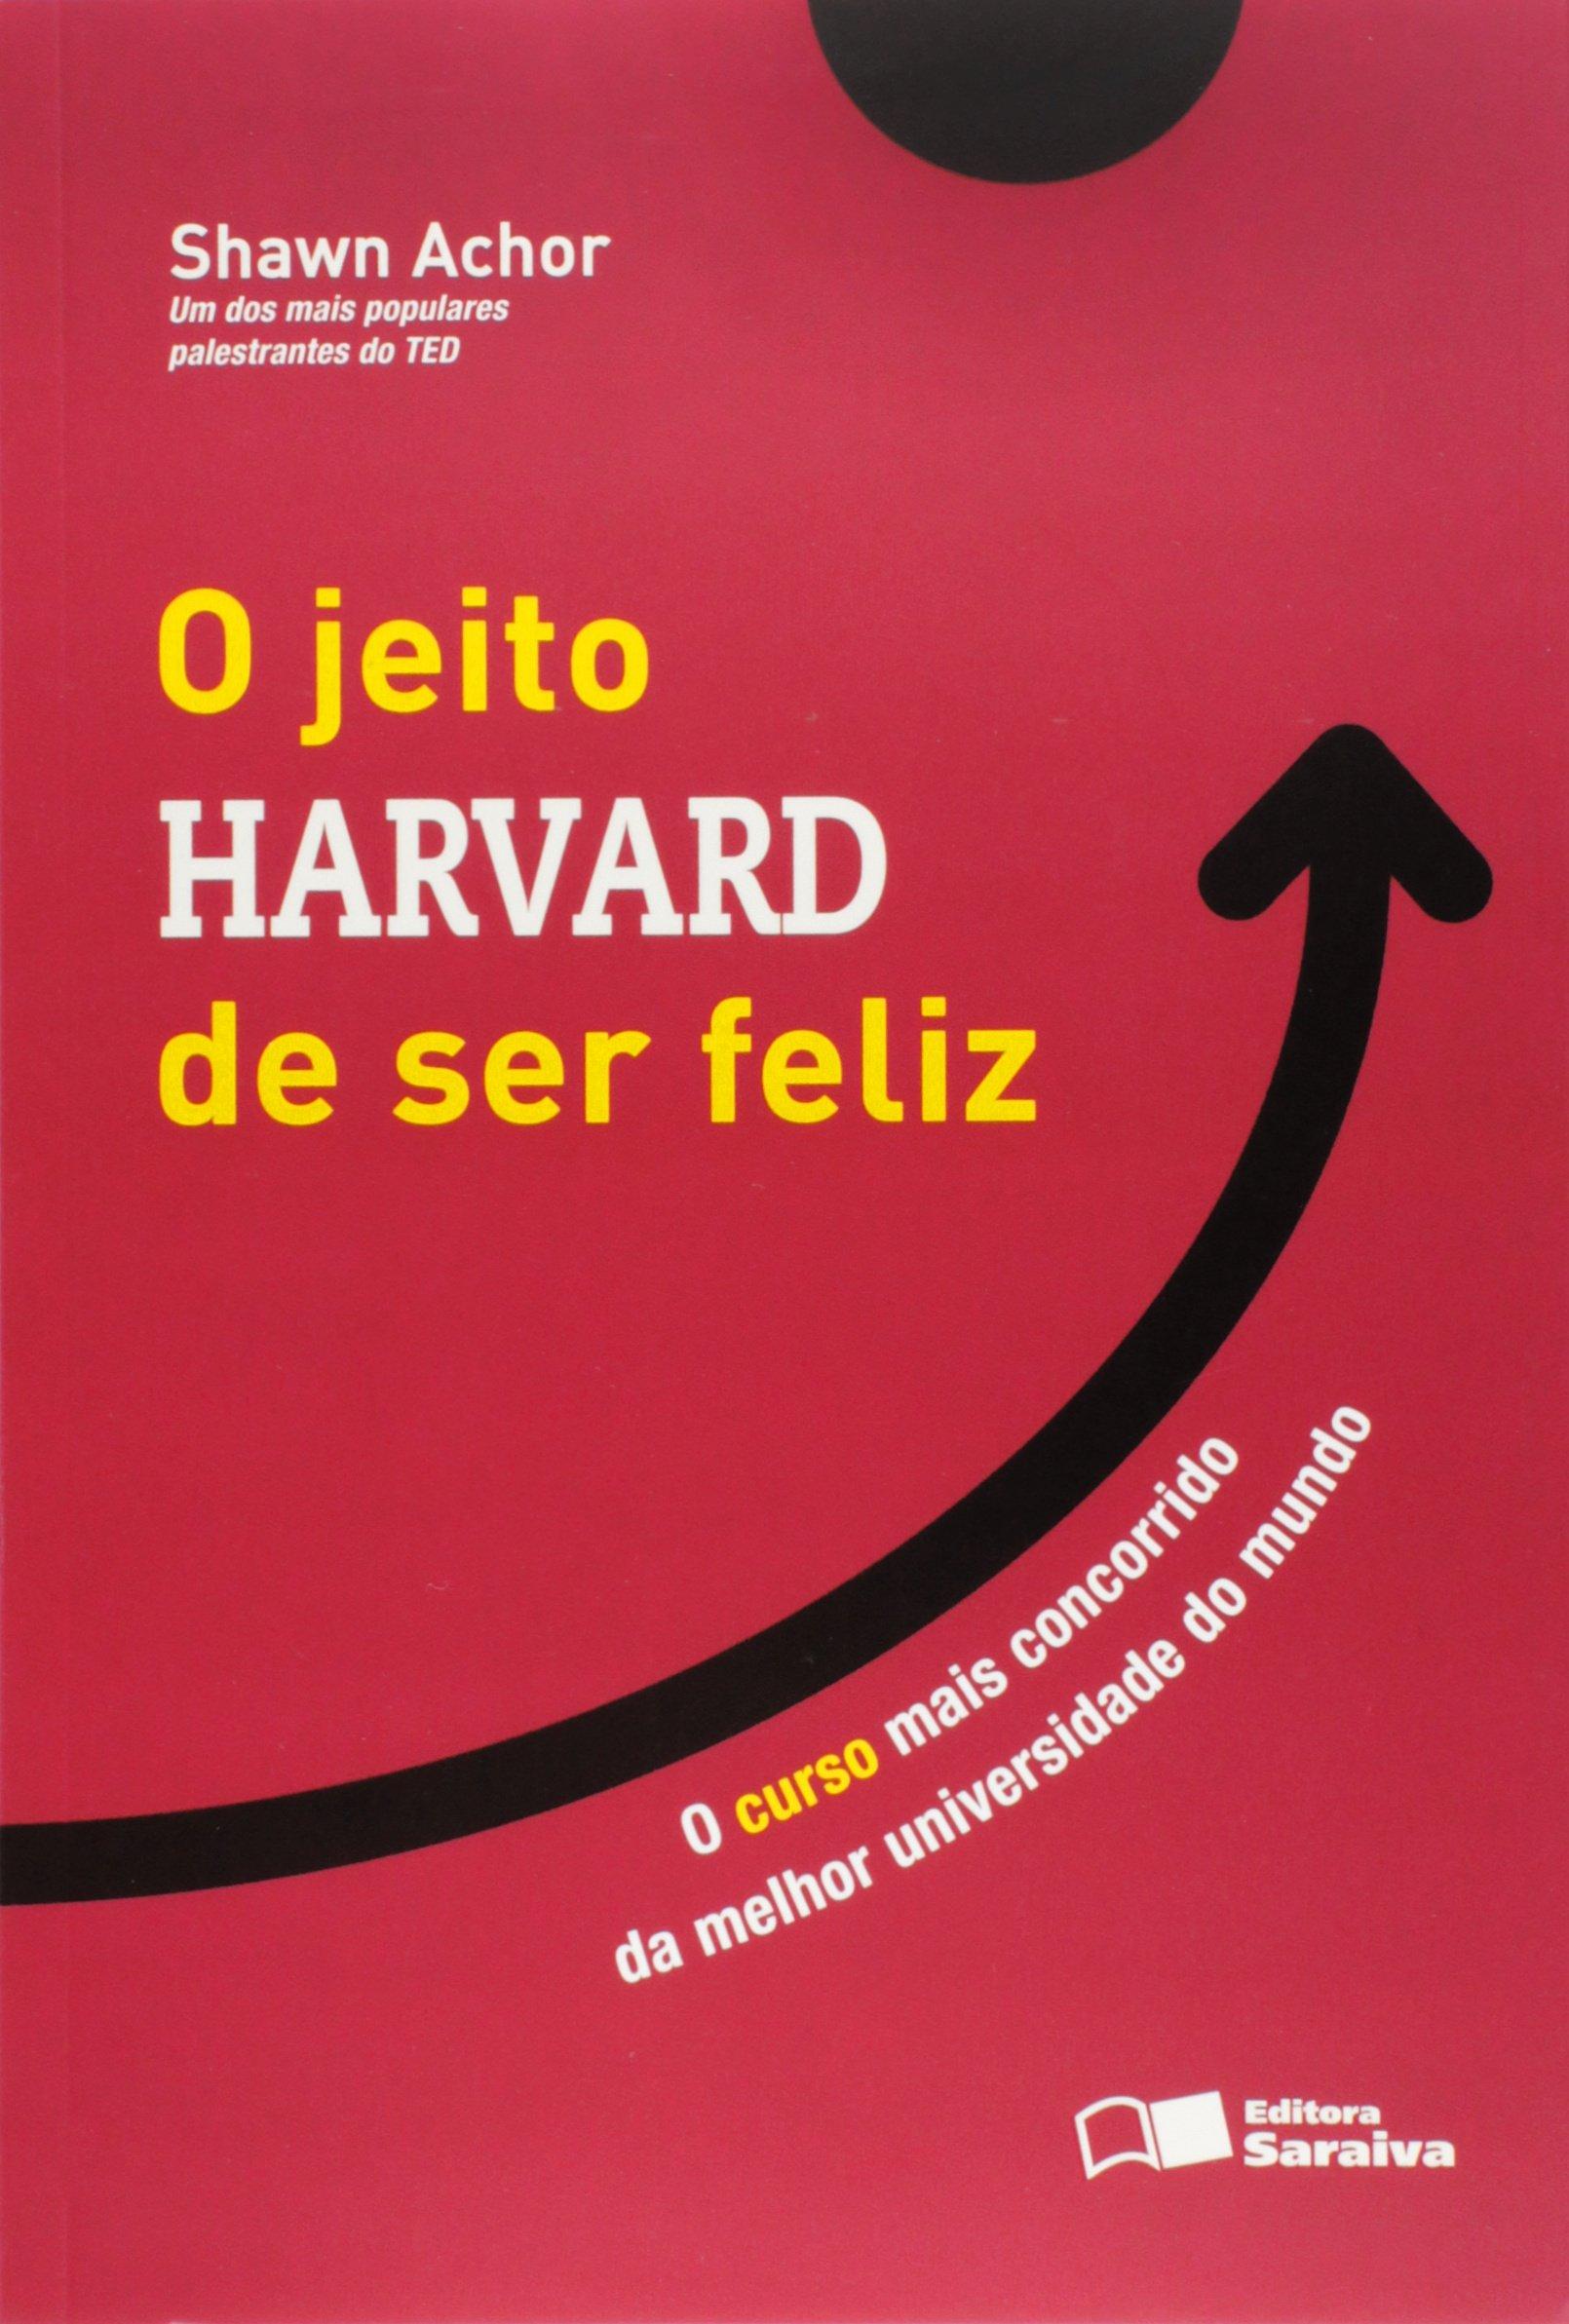 Livros: Editora Saraiva na Amazon.com.br